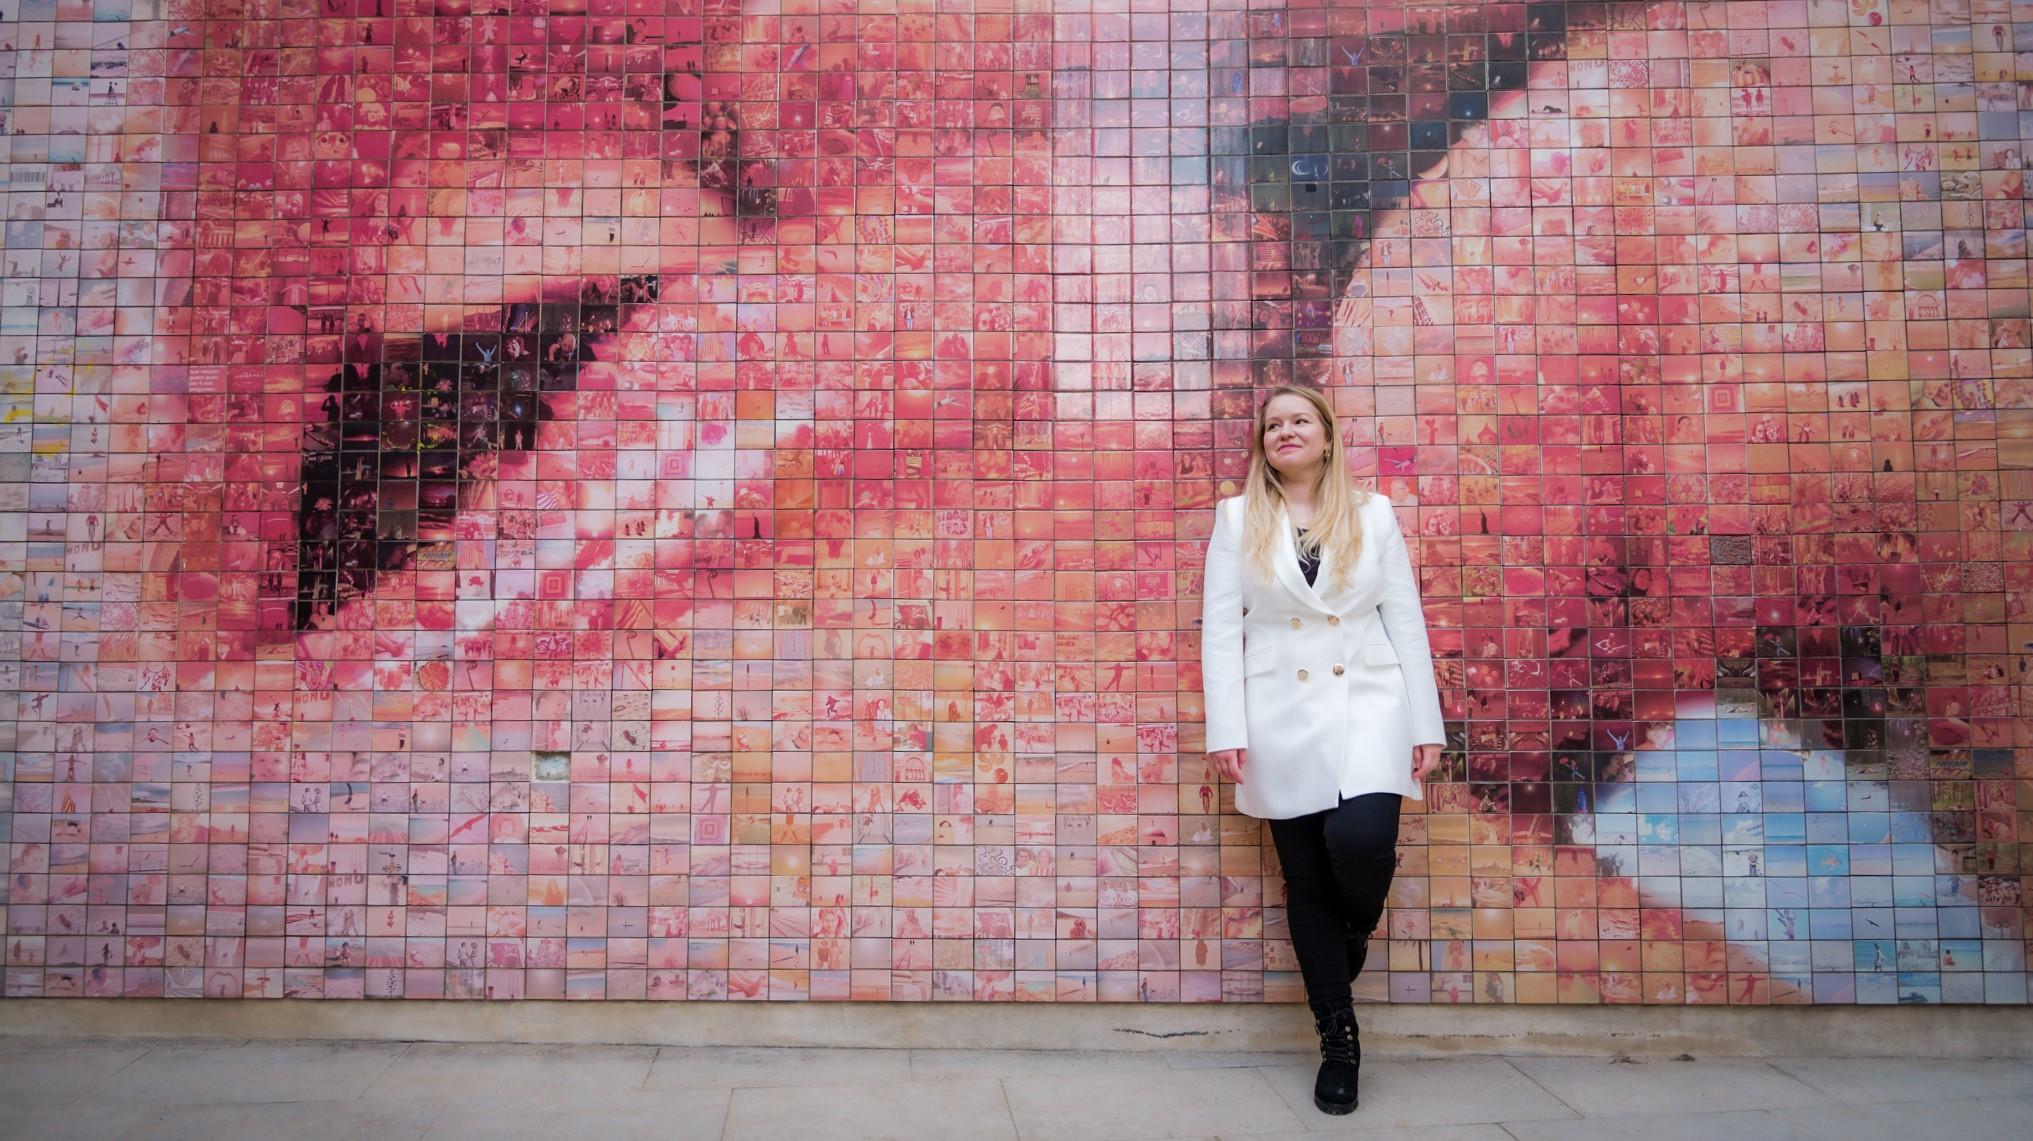 Intrepid Emma instead of El Beso mural in Barcelona